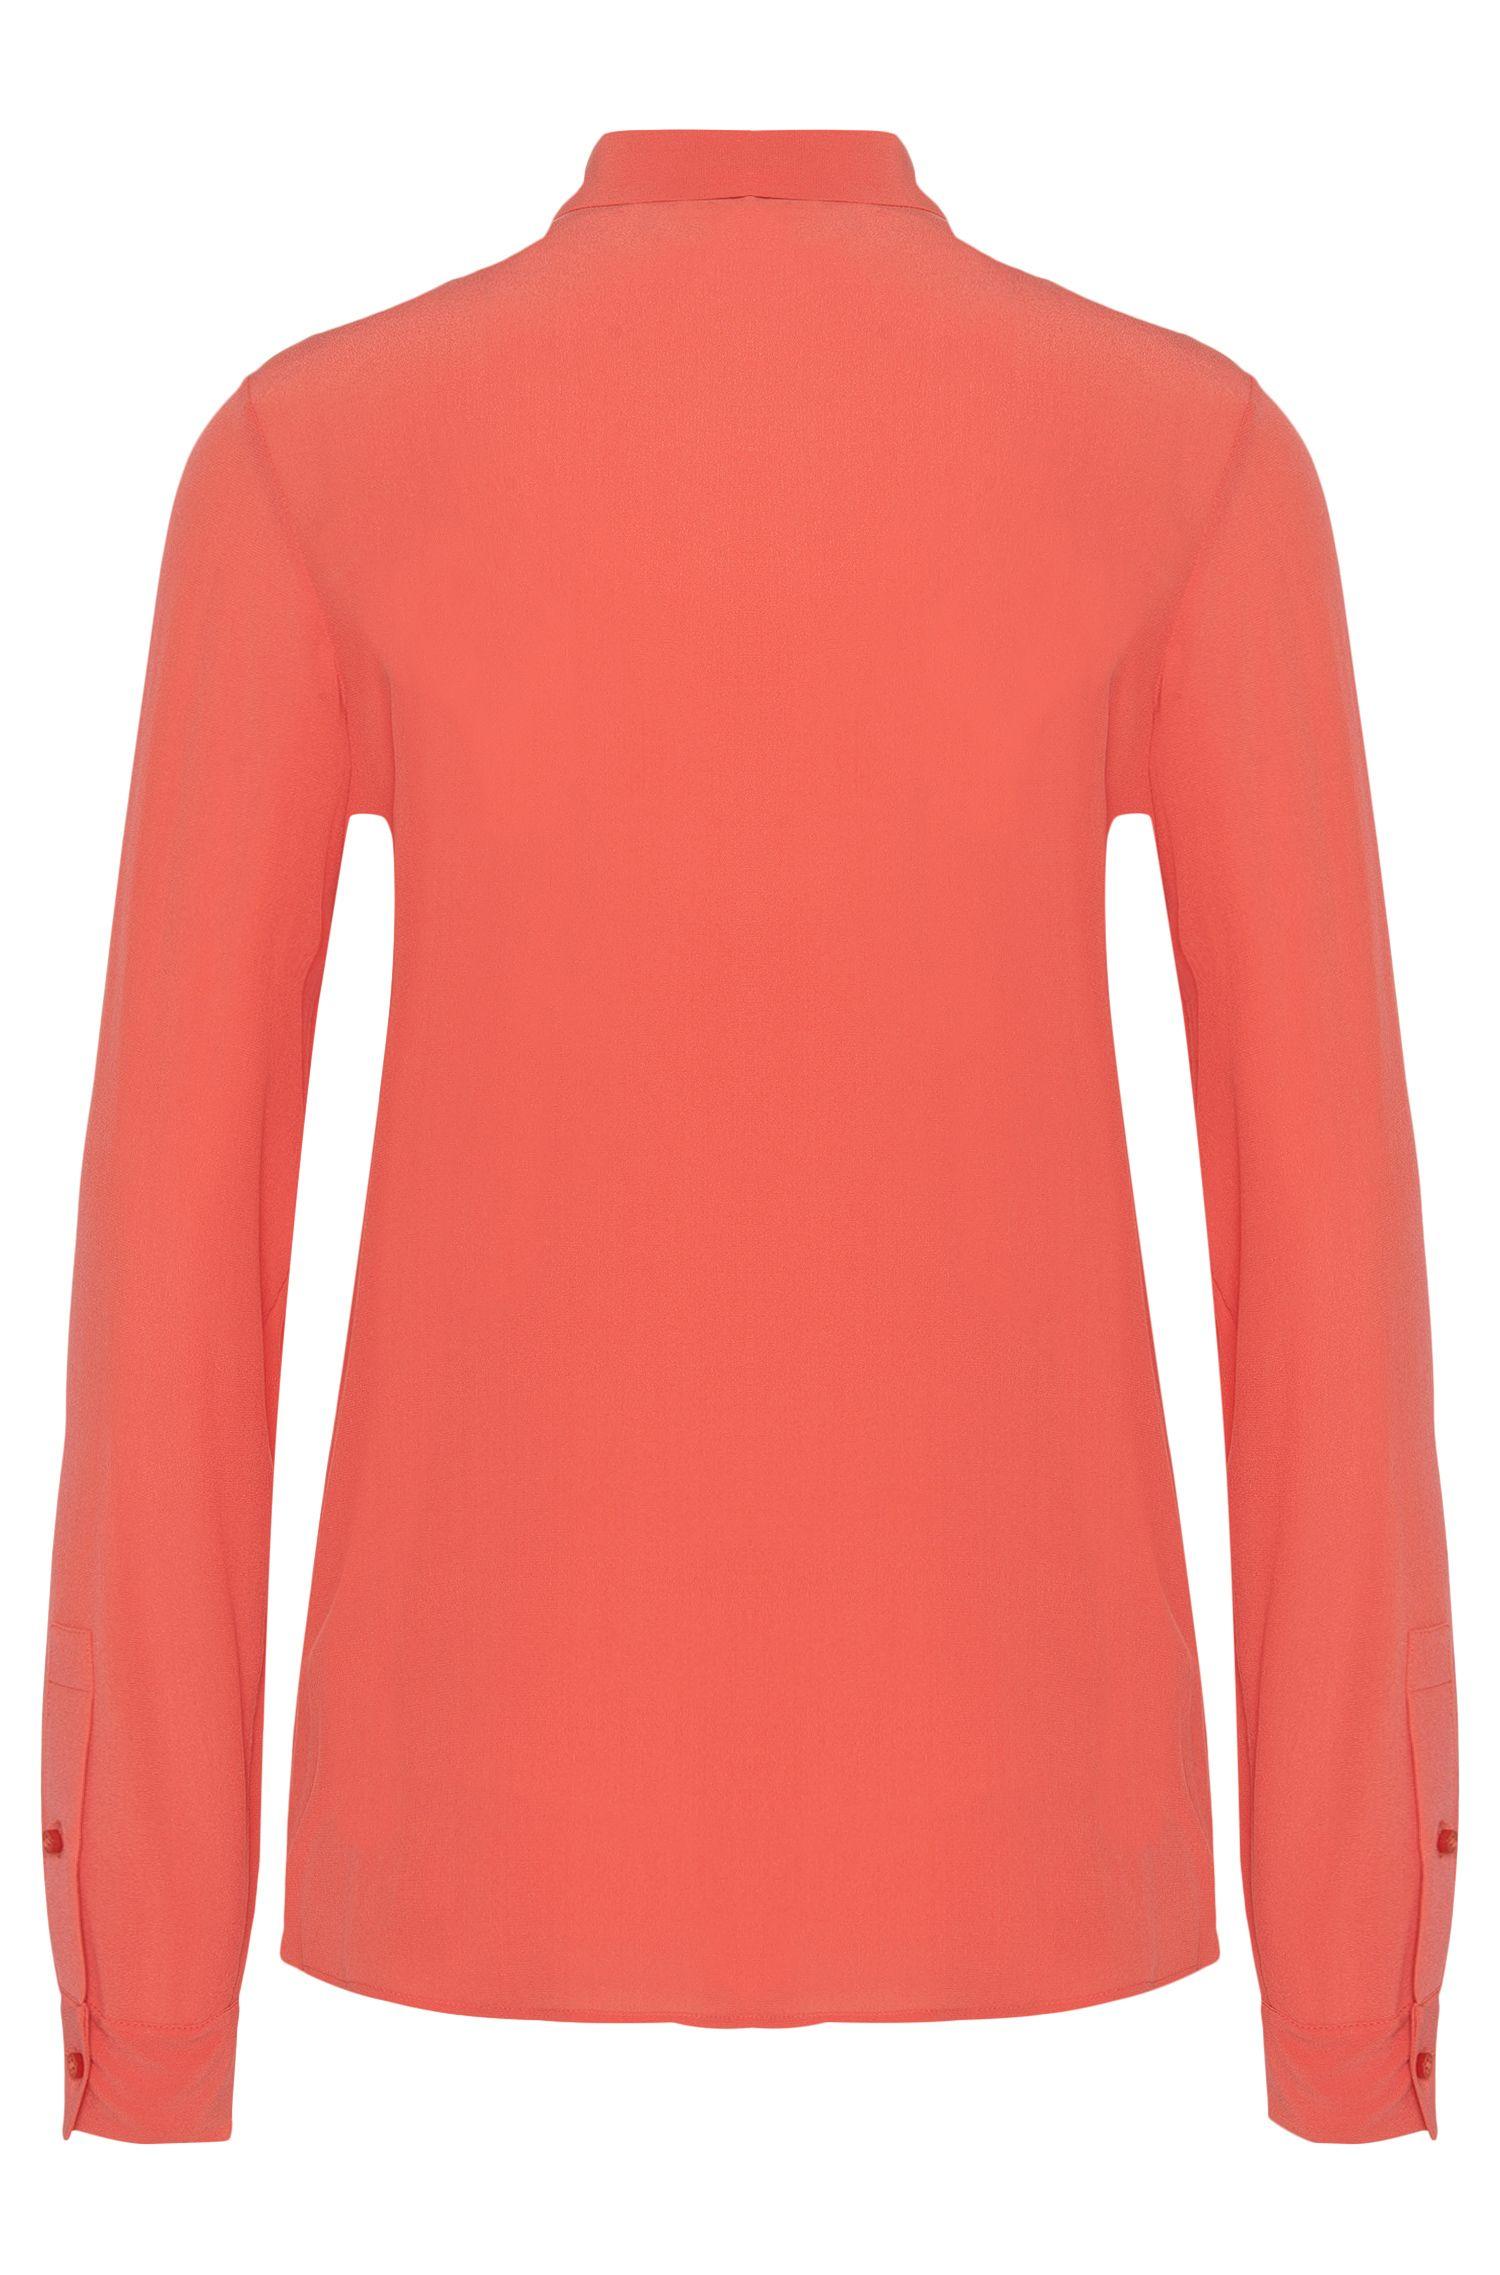 Regular-Fit Bluse aus Seide mit krempelbaren Ärmeln: 'Relara'